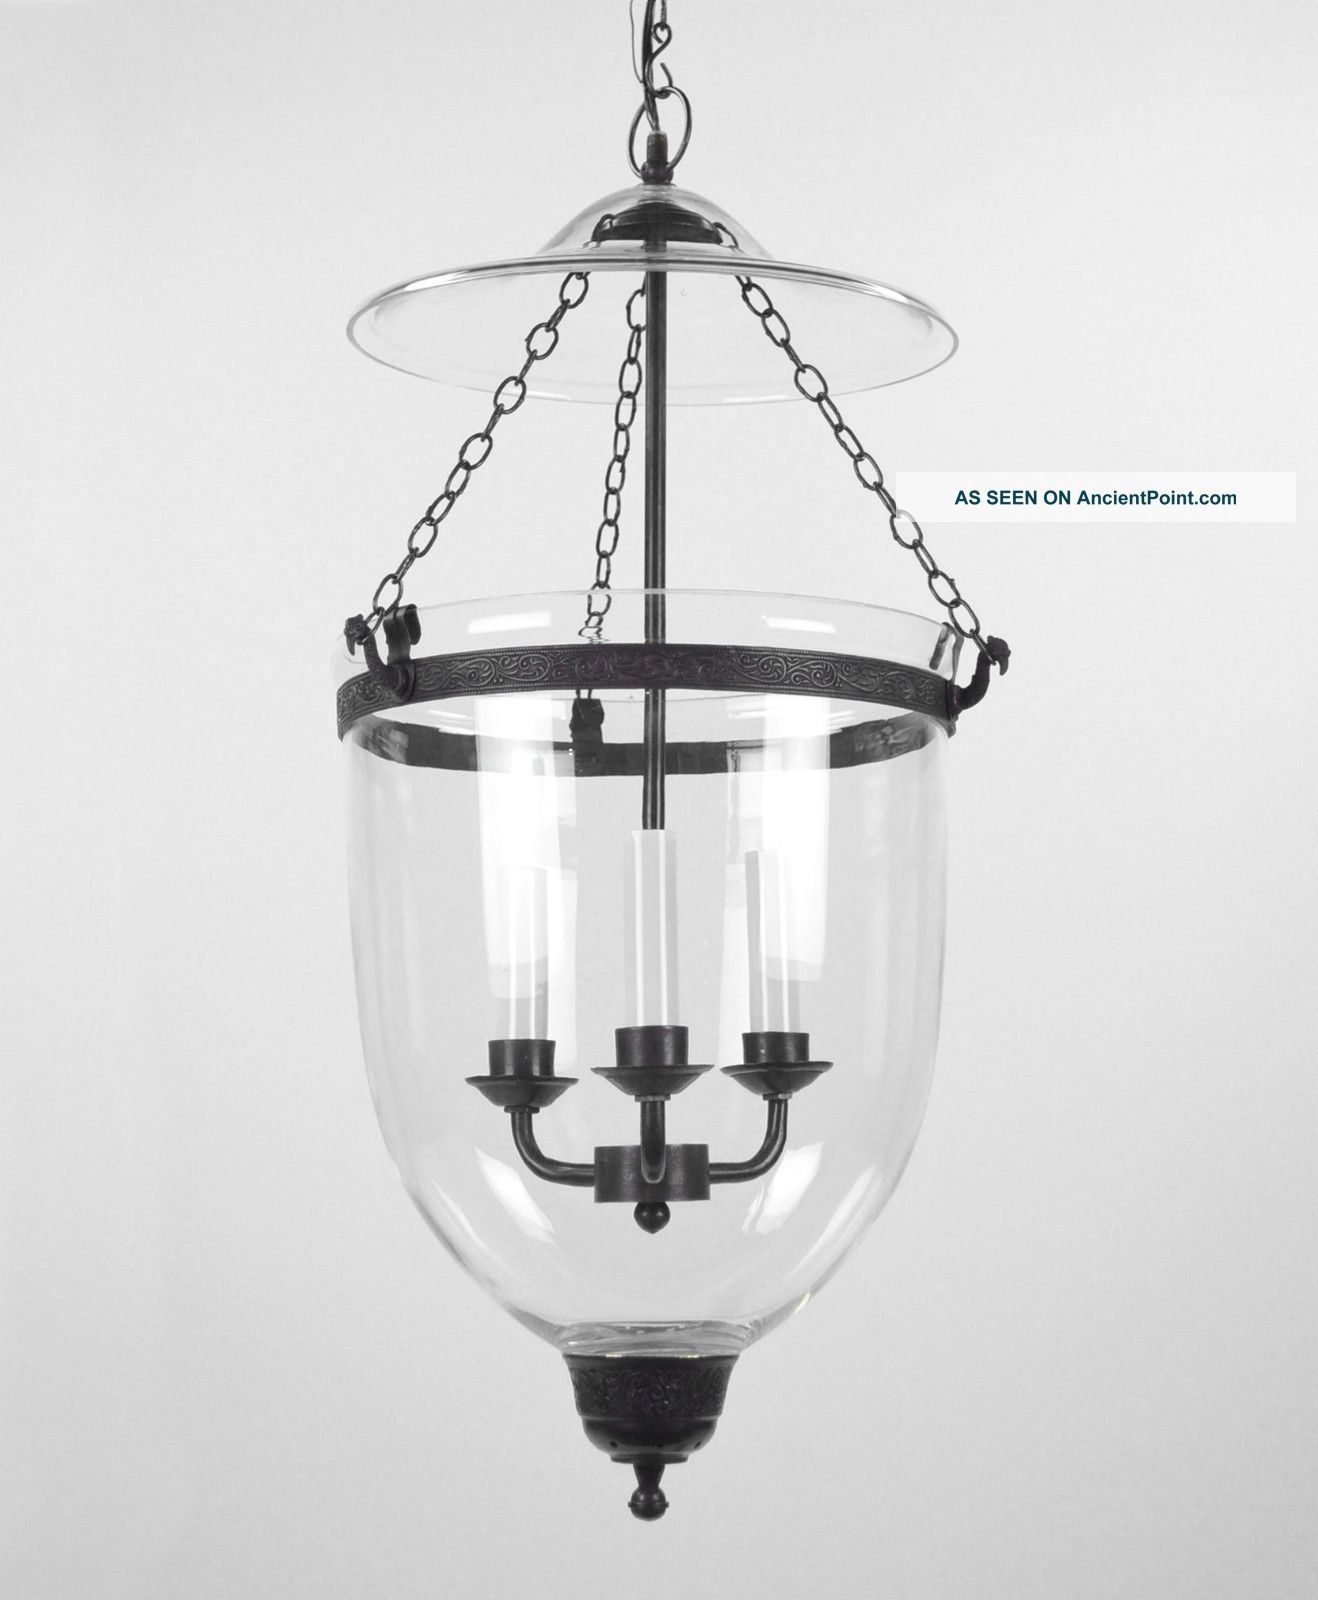 Bell jar pendant lighting fixtures deairankfo pinterest